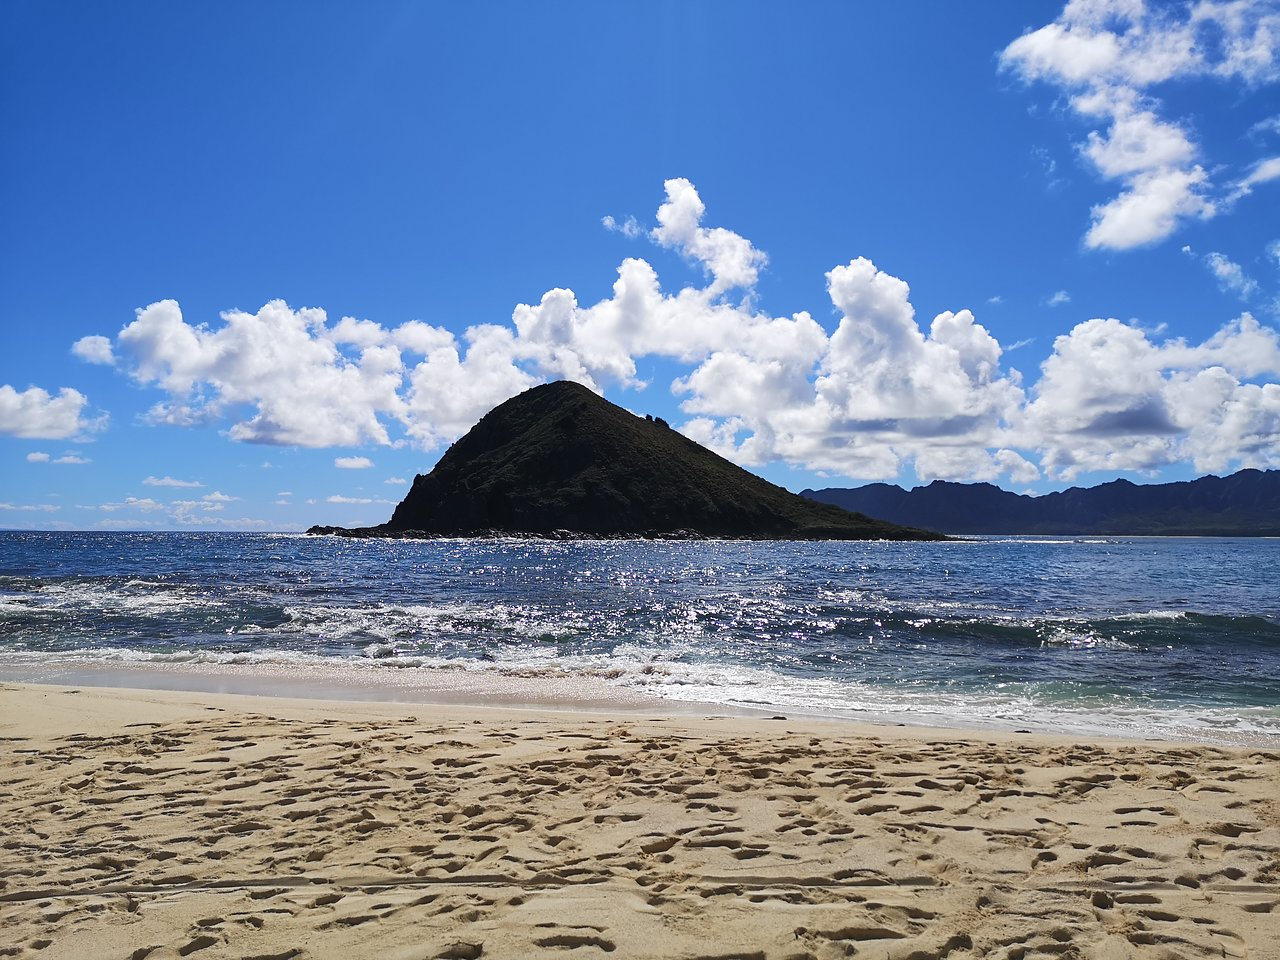 Kailua Beach Guided Tour To The Mokulua Islands Full Day